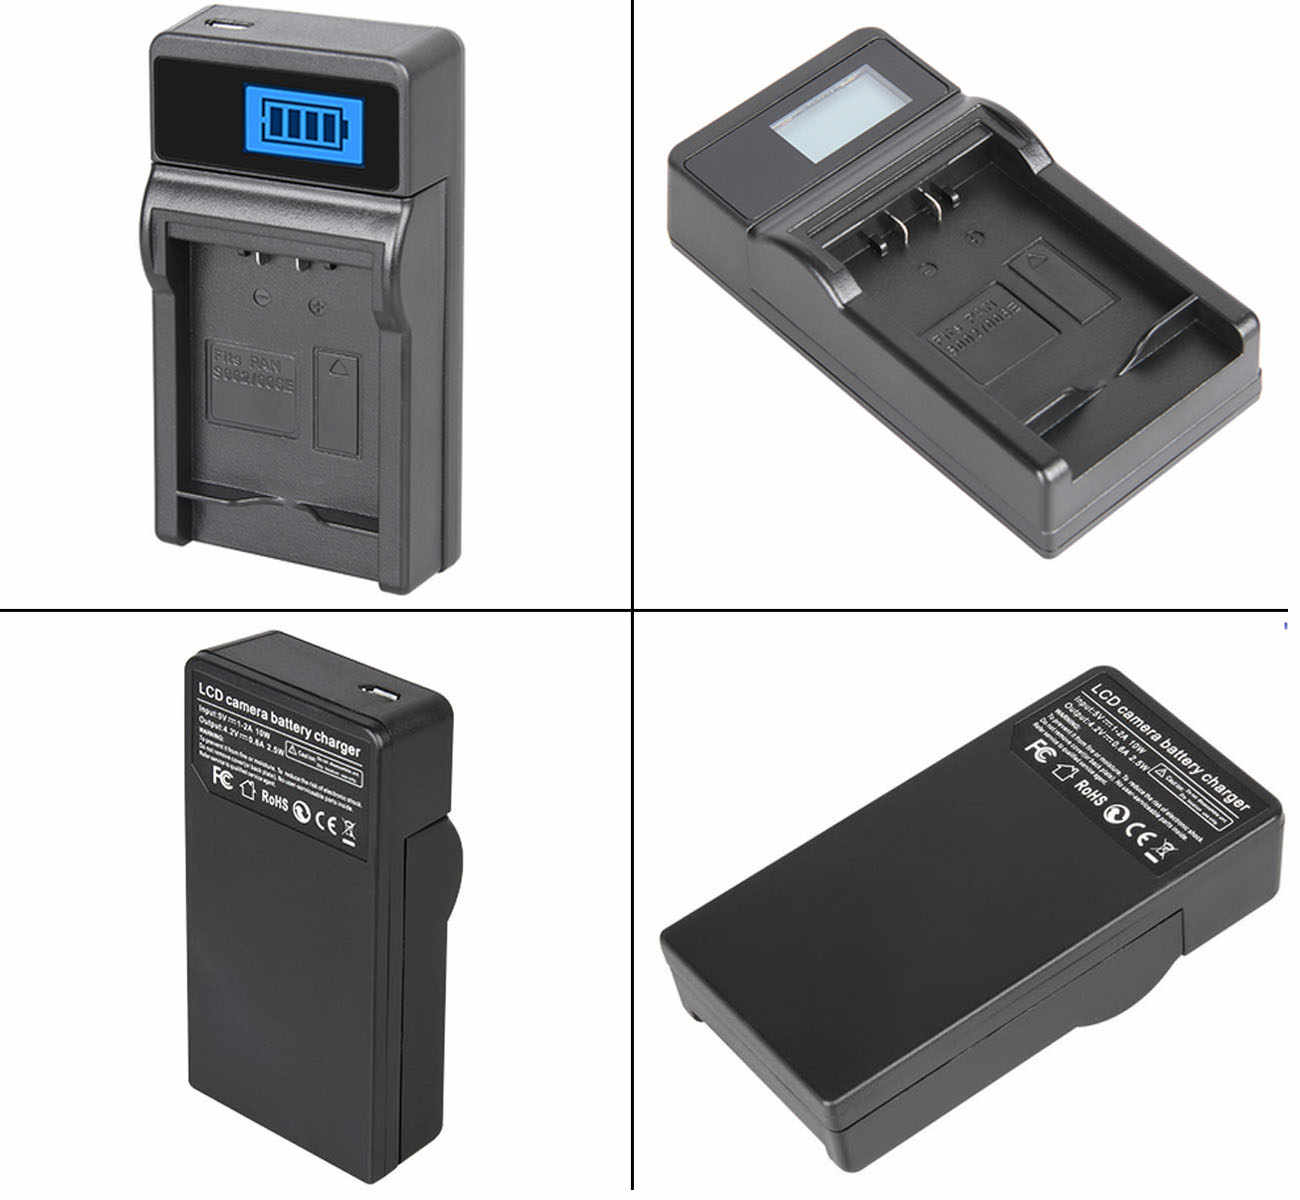 LCD Micro USB Battery Charger For JVC Everio GZ-MG365 GZ-MG365BUS Camcorder GZ-MG365BU GZ-MG365U